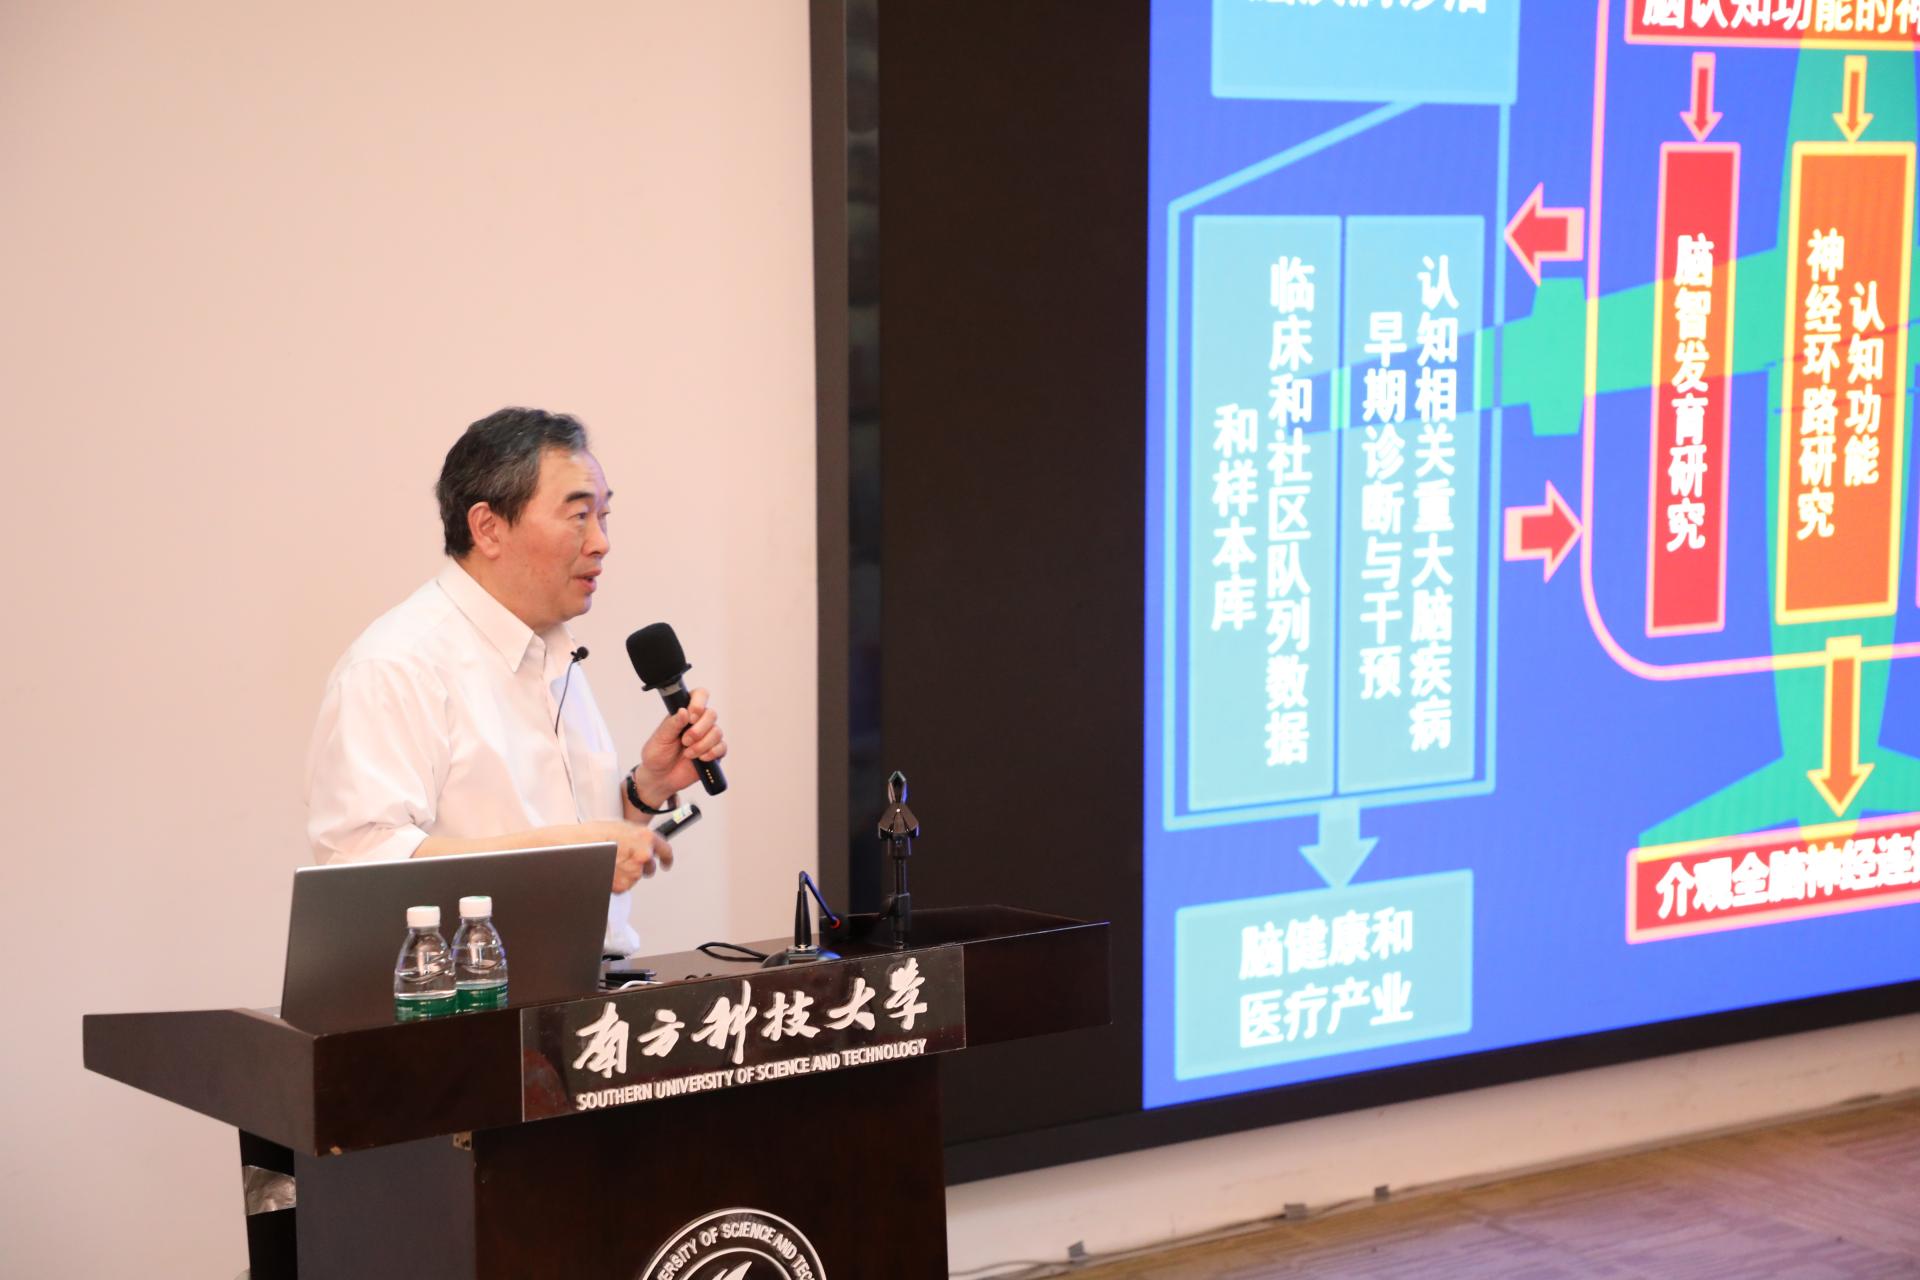 Academician Mu-ming POO shares research on brain neuroplasticity